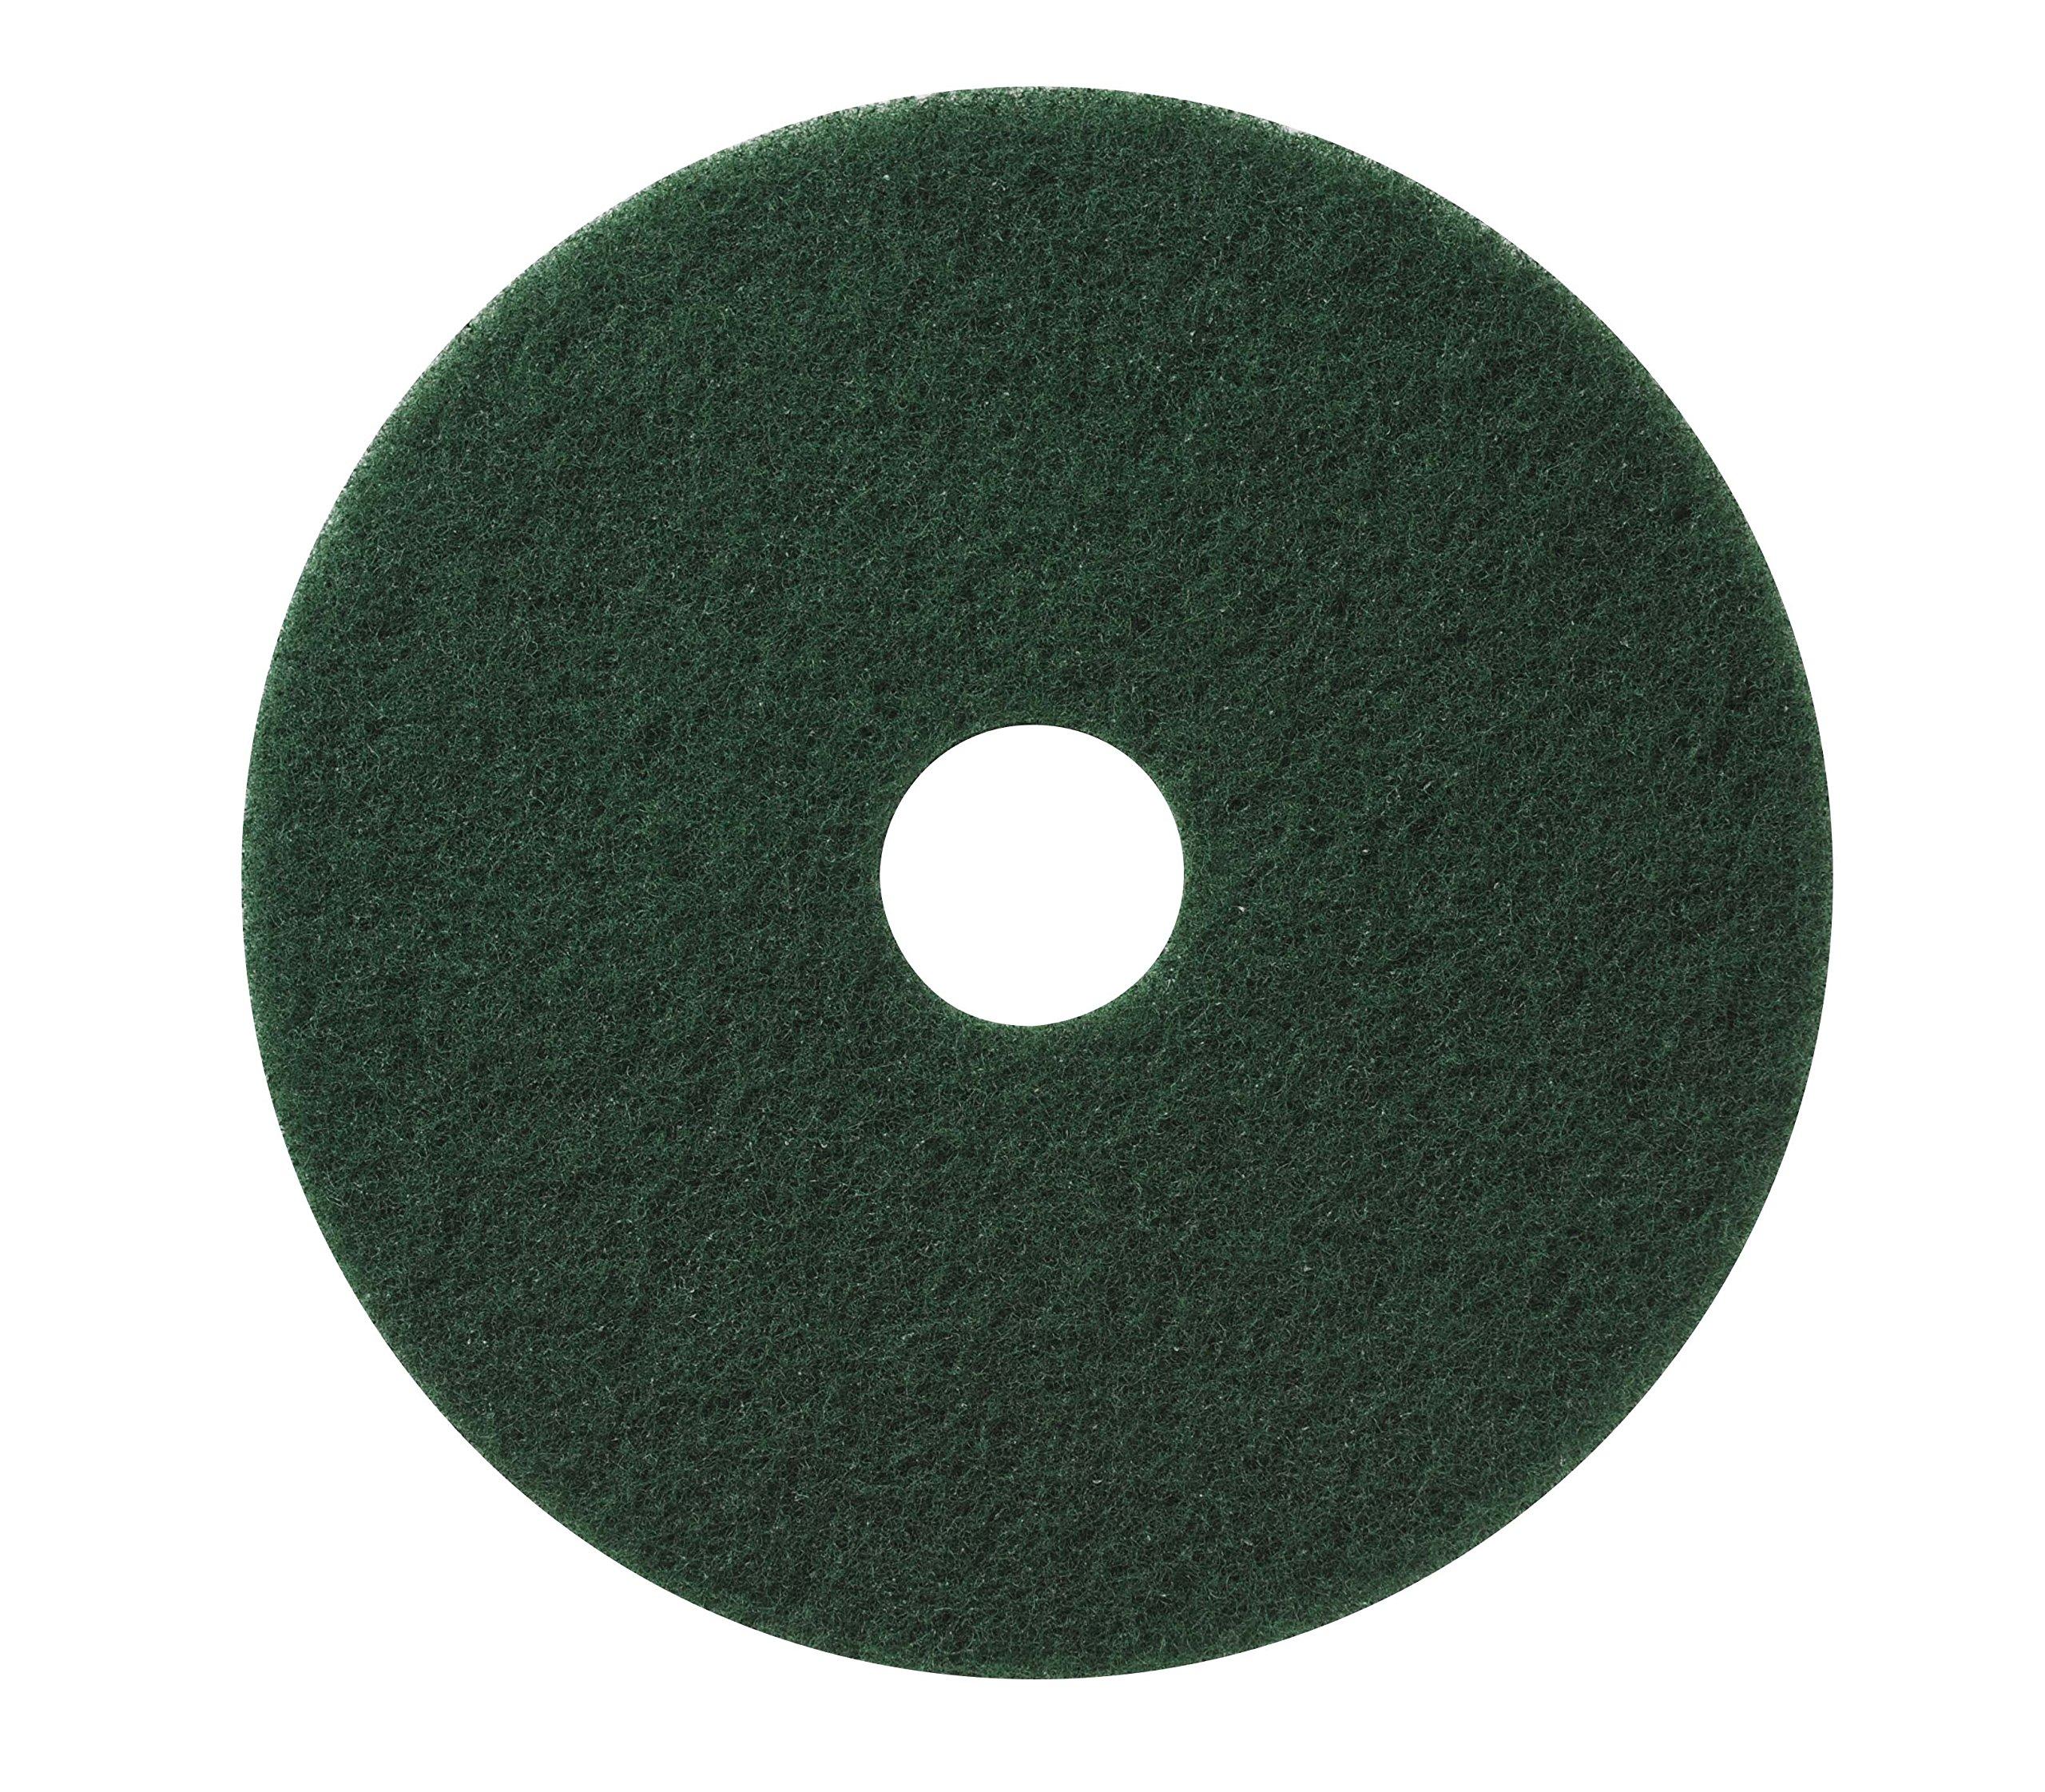 Glit / Microtron 400320 Wet Scrub/Light Strip Pad, 20'', Green (Pack of 5)